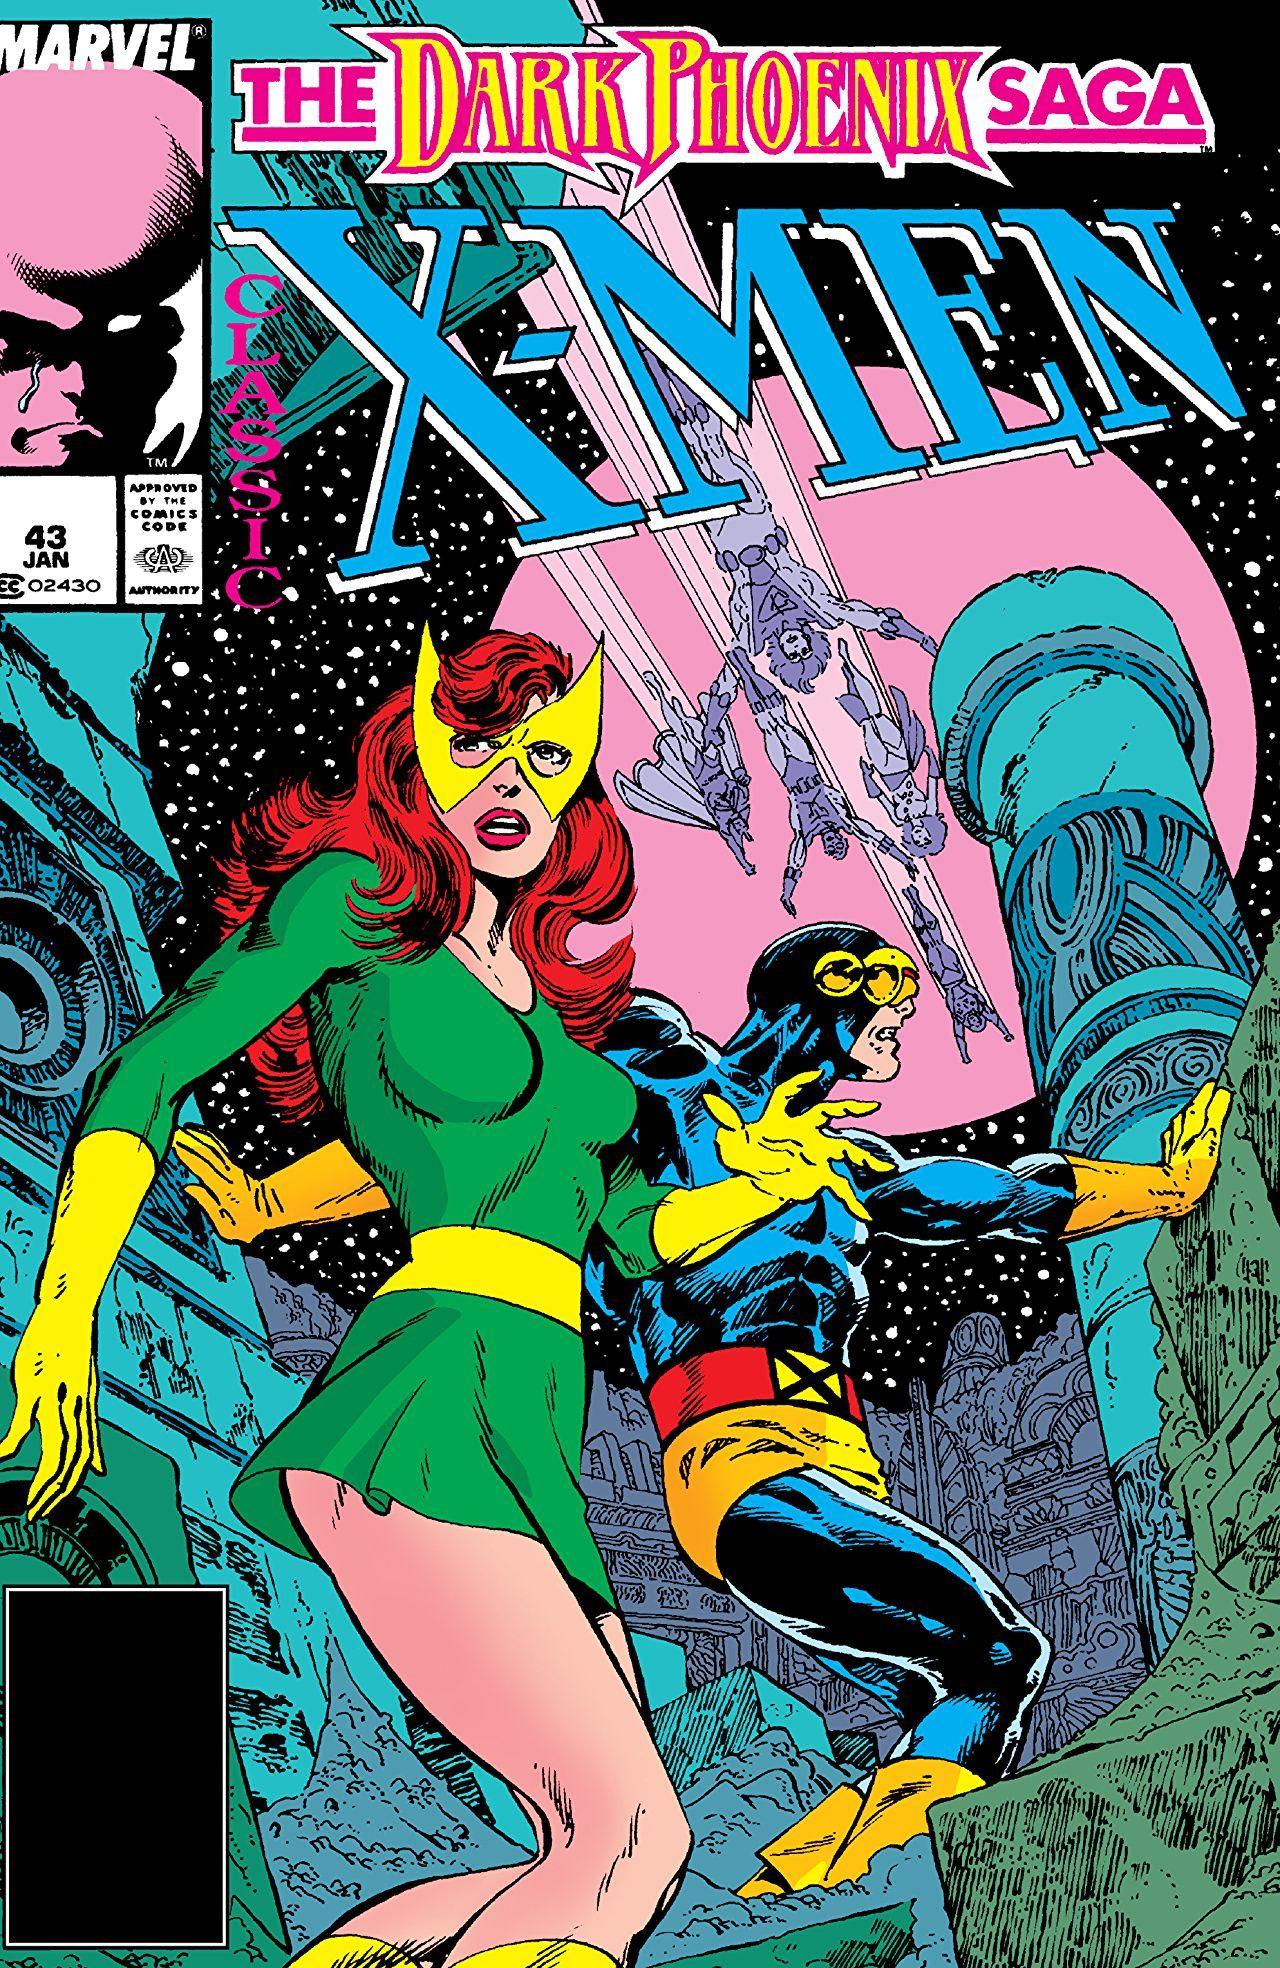 Classic X Men 1986 1990 43 Comics By Comixology In 2020 X Men Dark Phoenix Saga Comic